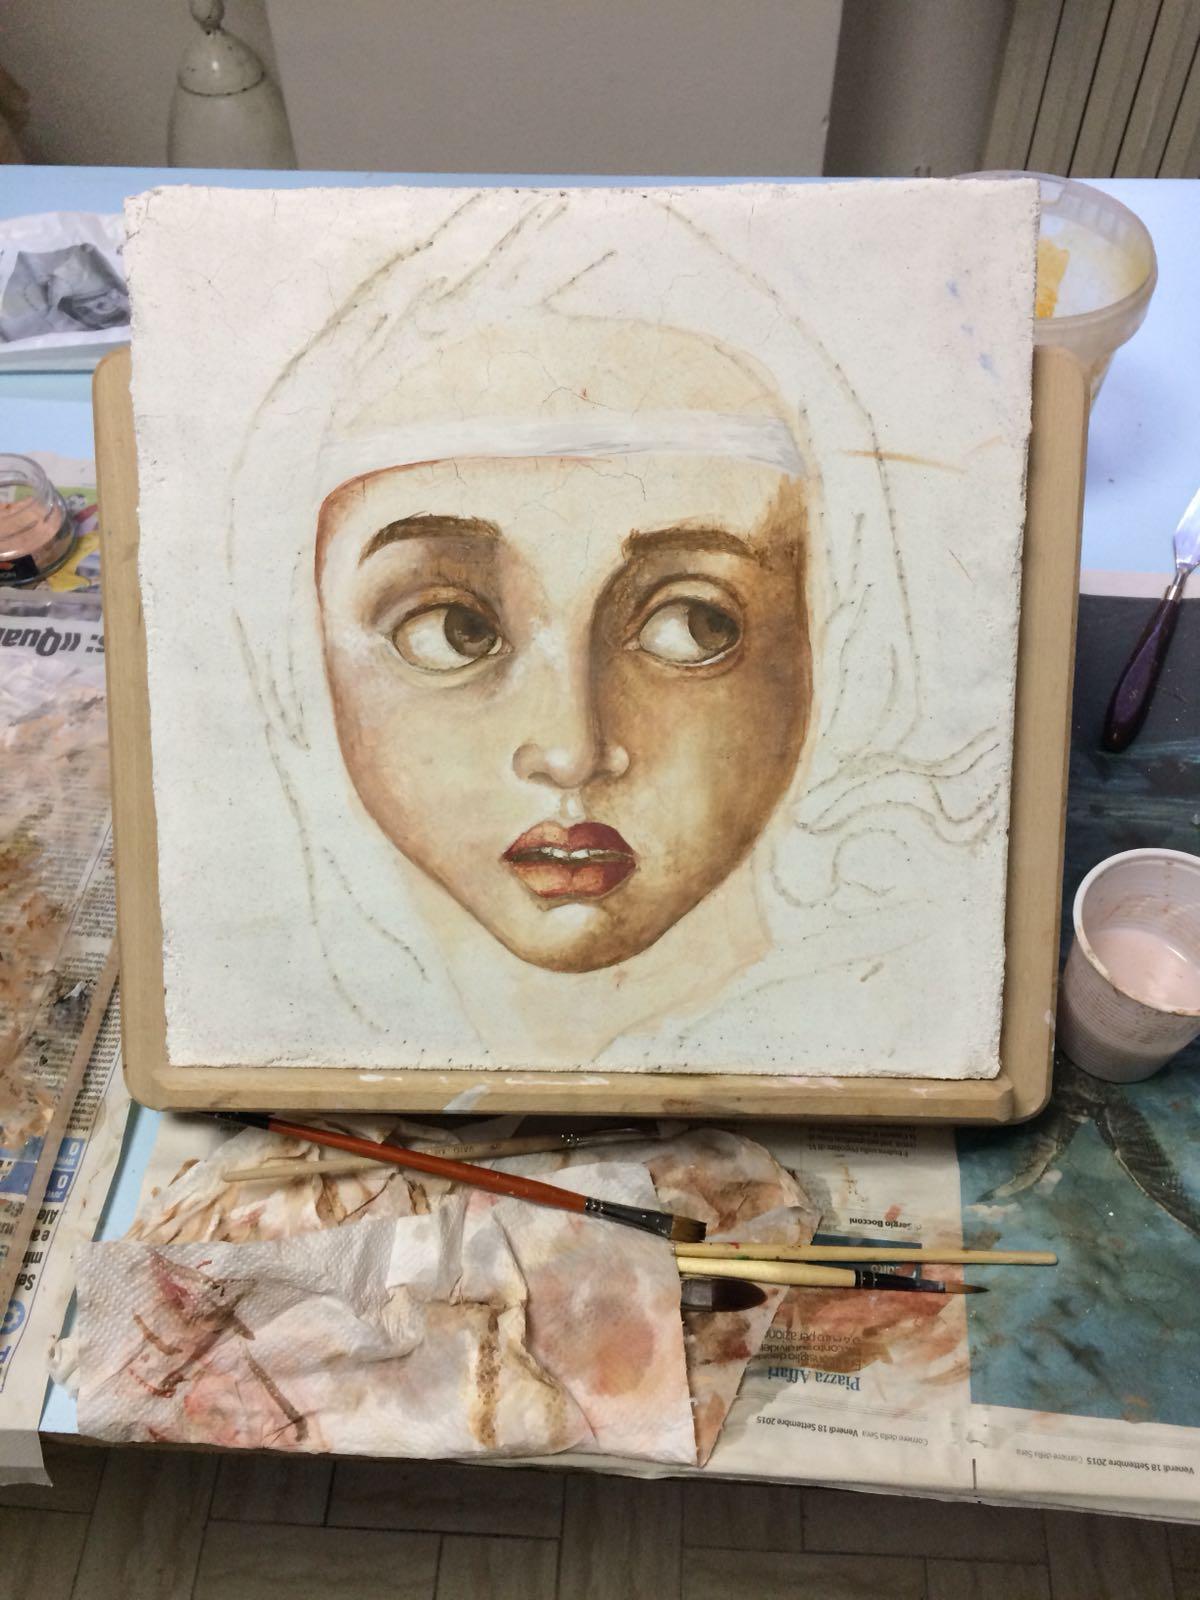 Siena's fresco begins